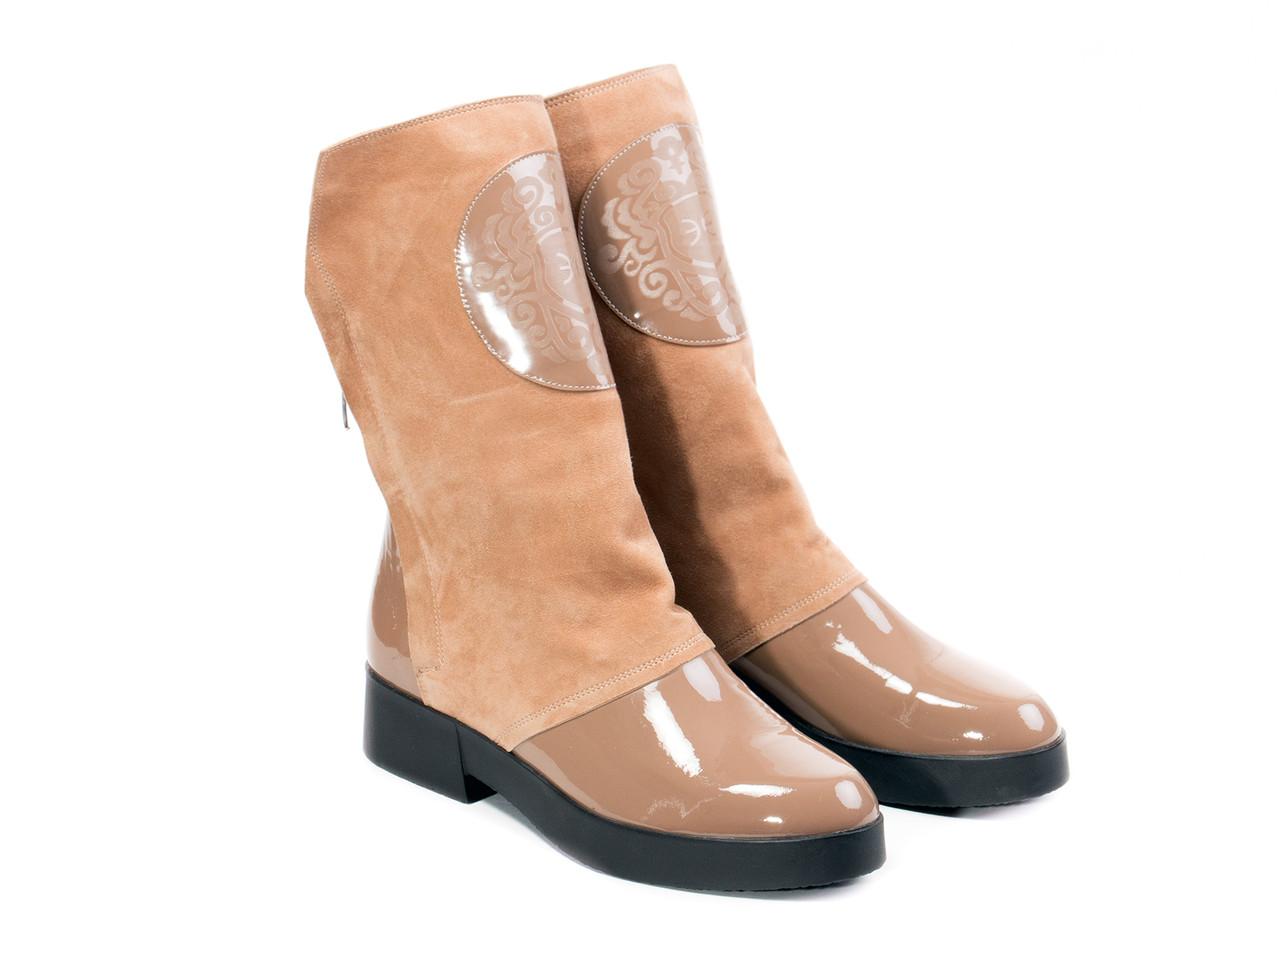 Ботинки Etor 4937-0-7235 бежевые